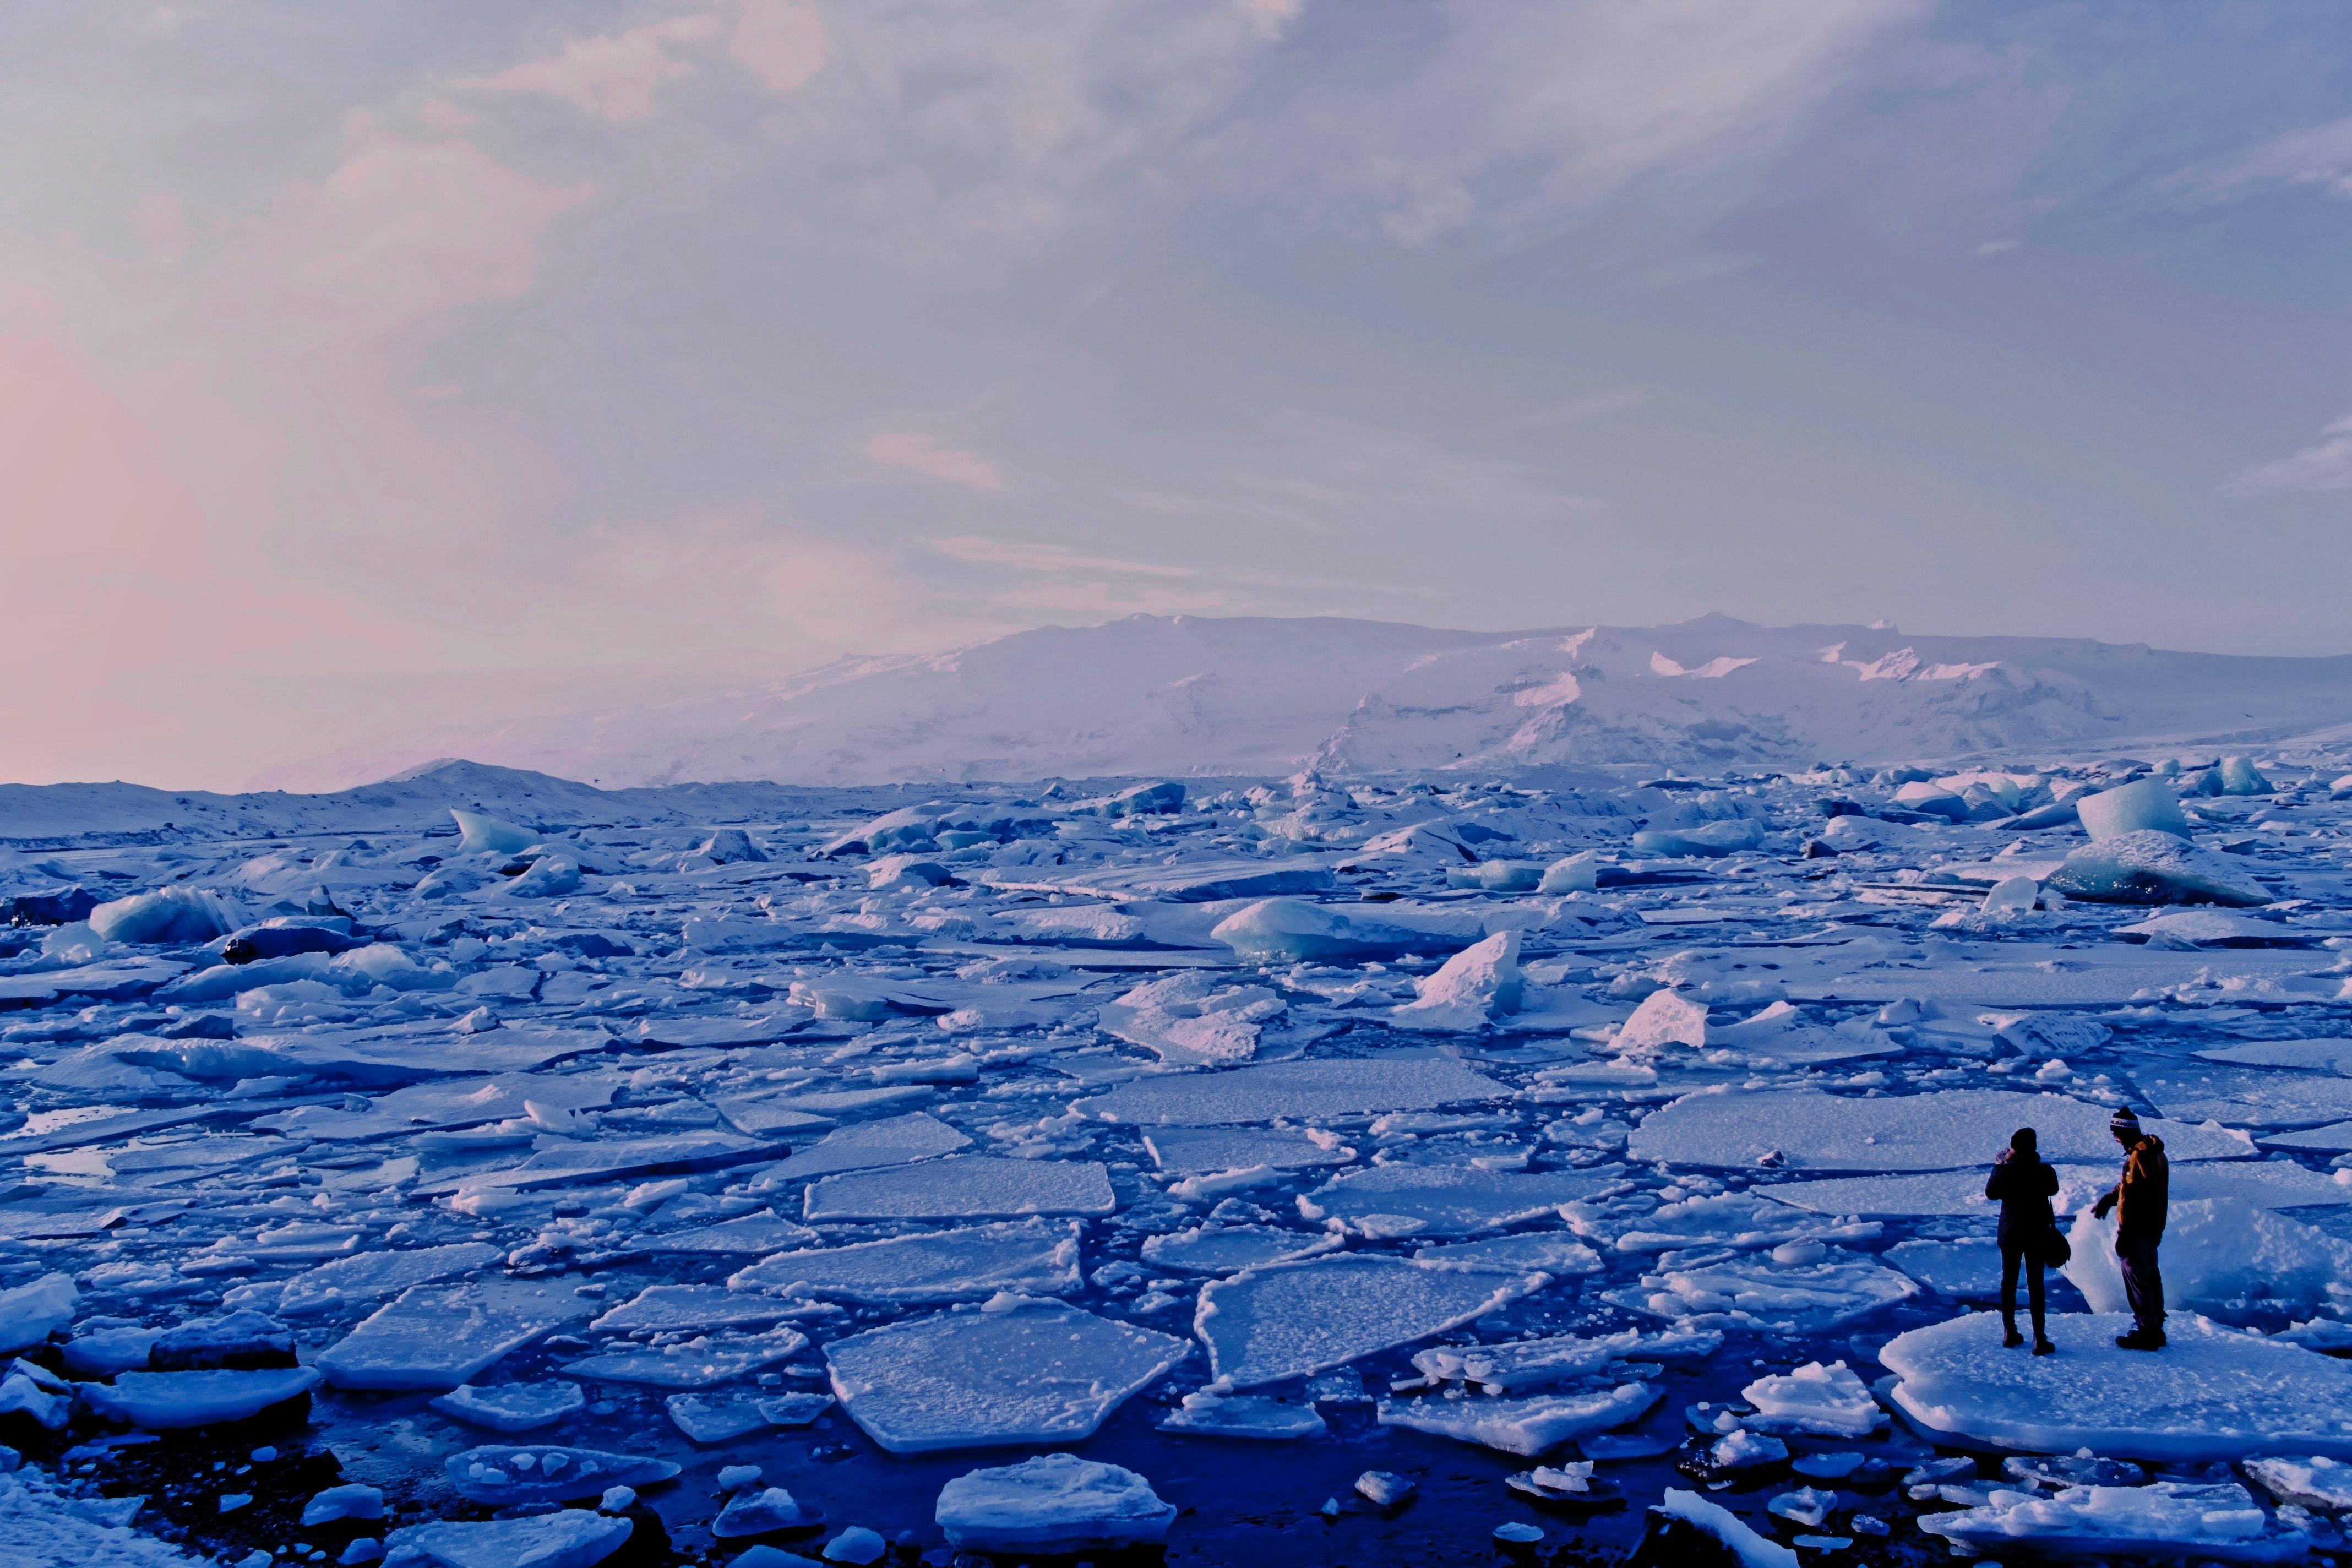 Arctic ice melting into the sea.